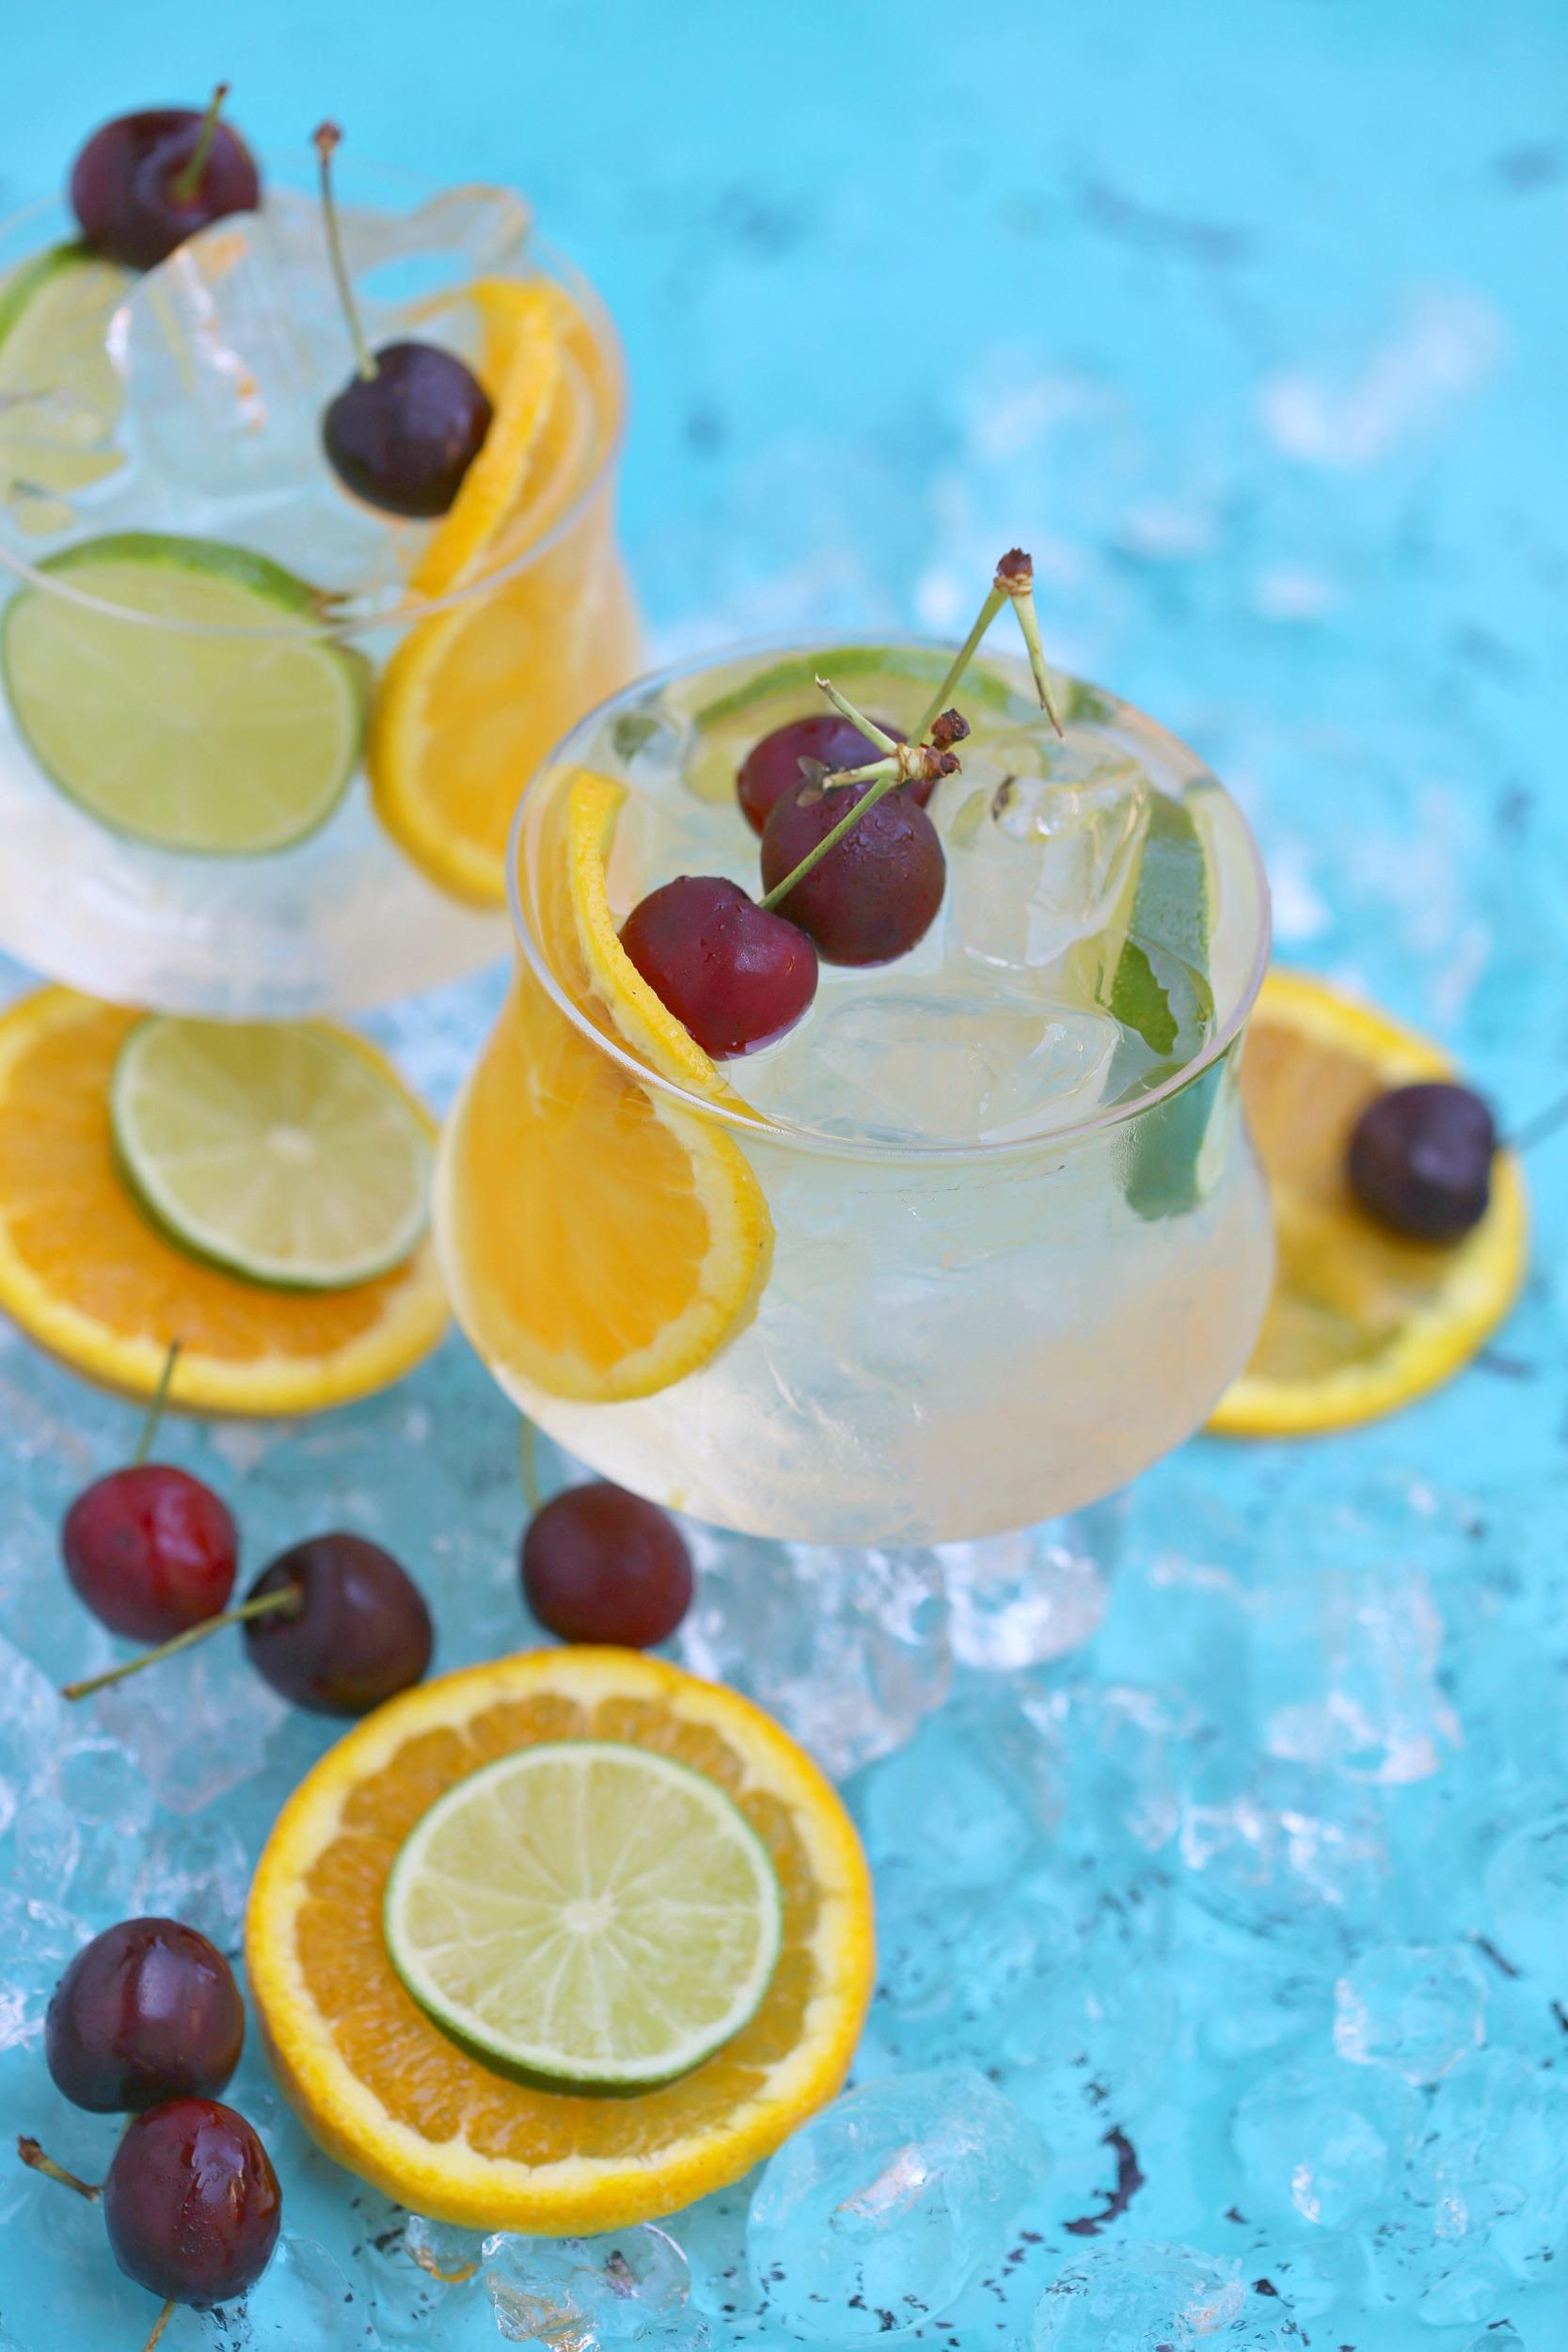 coconut-citrus-sangria-cocktail-vianneyrodriguez-sweetlifebake